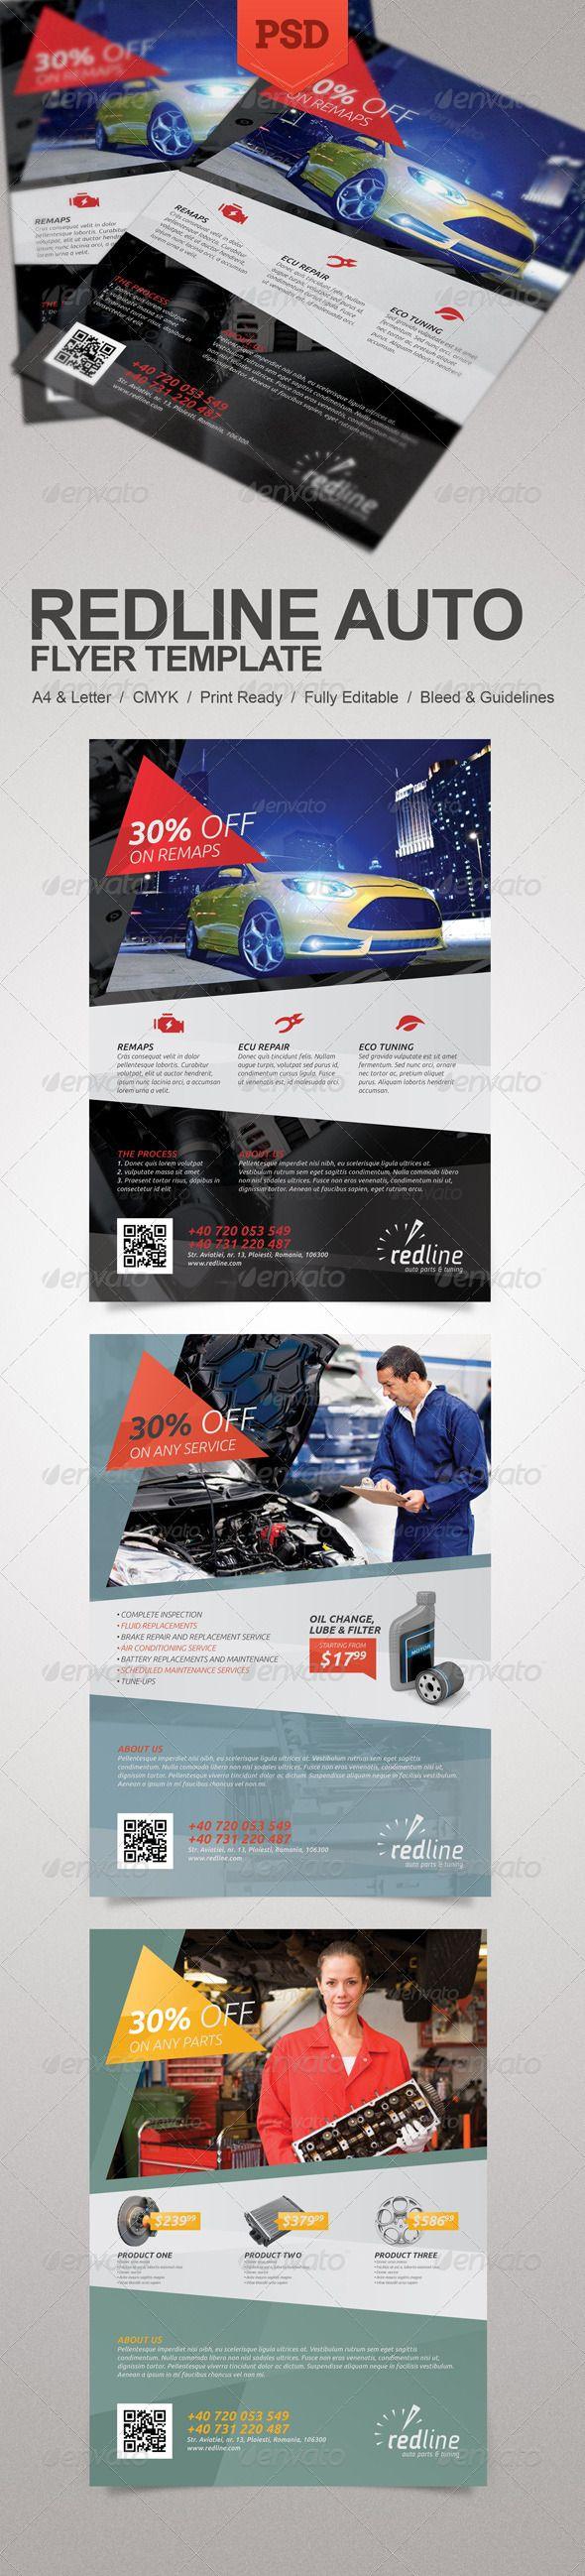 Auto body repair checklist template success success auto repair shop - Redline Auto Flyer